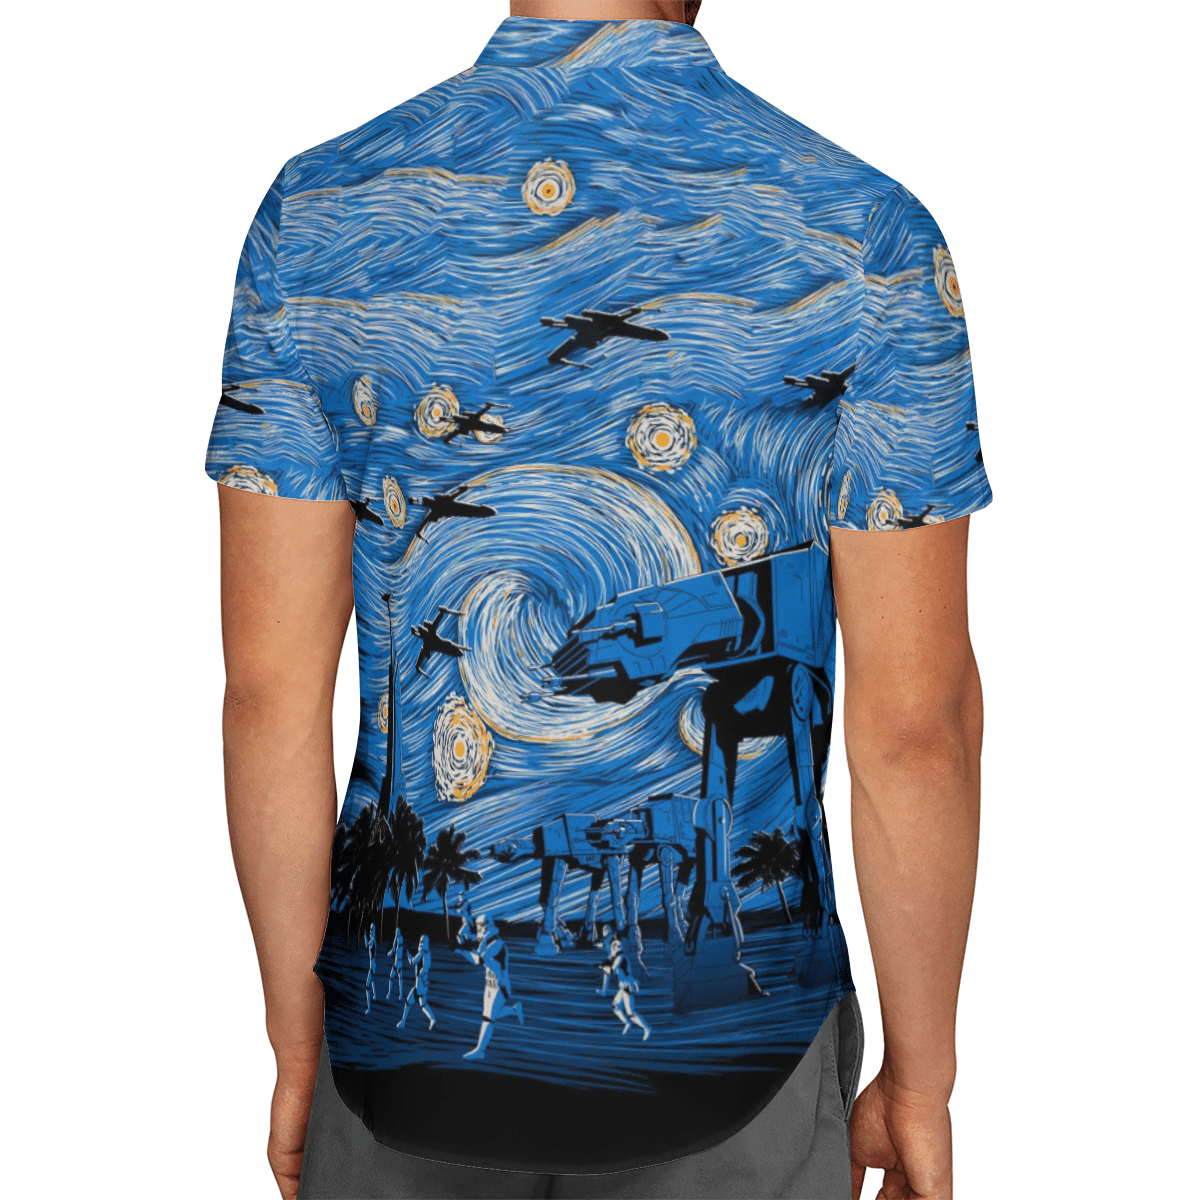 Star Wars Starry Night Hawaiian shirt 1